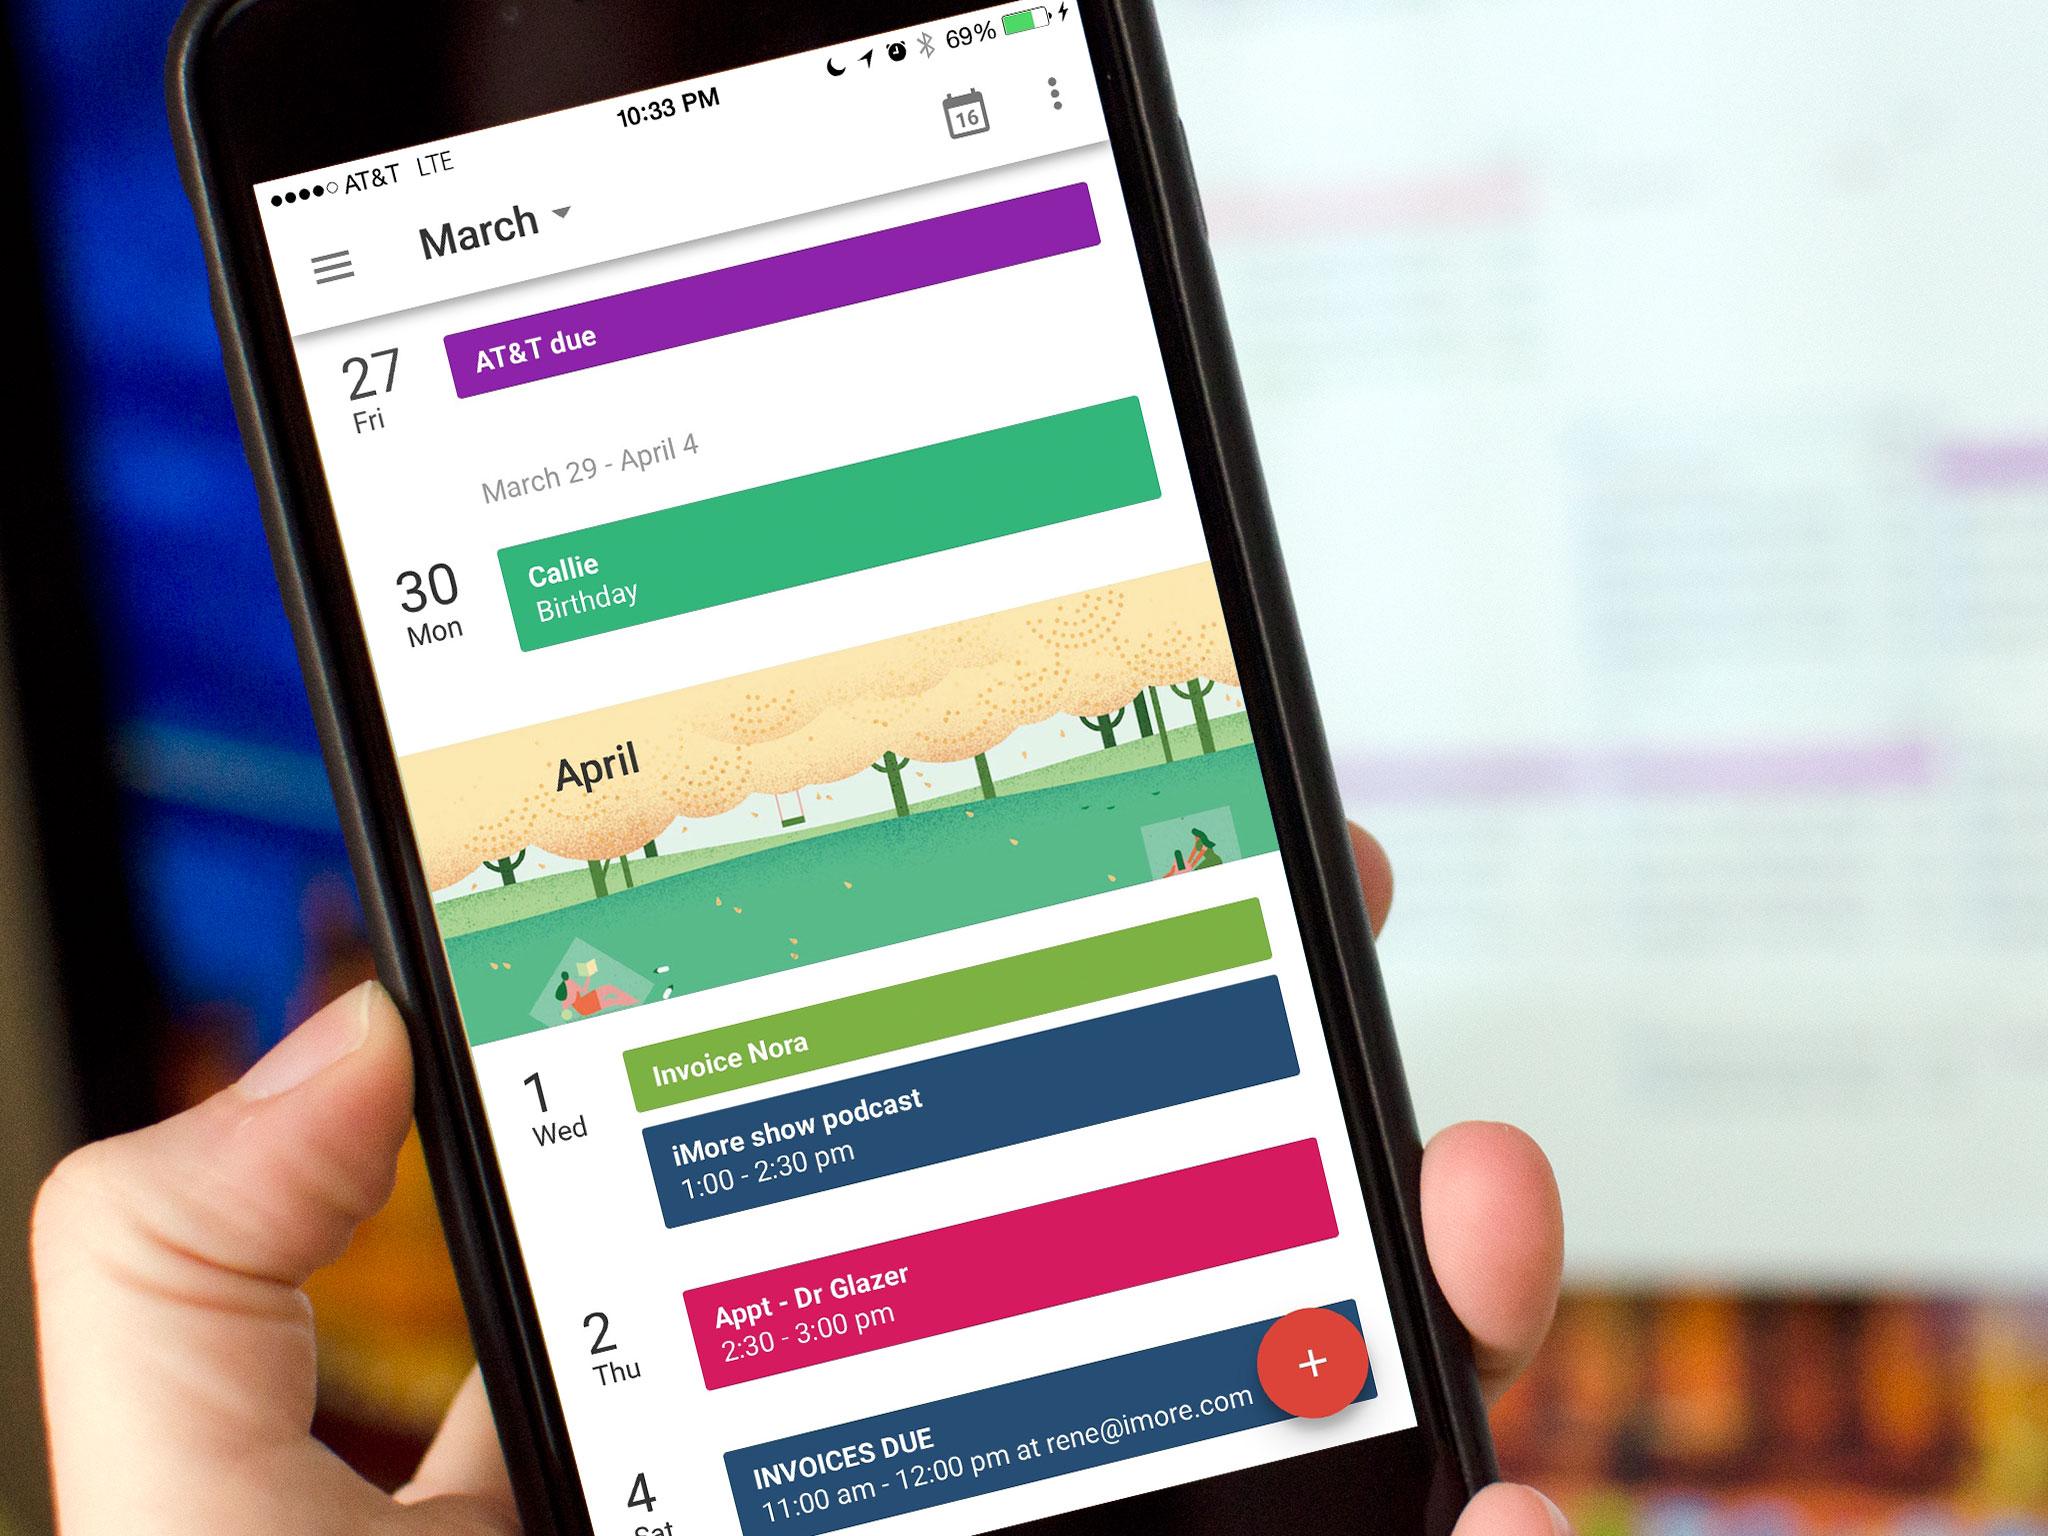 How To Setup A Google Calendar Review Get Reviews On Google Google My Business Help Google Kalender Auf Iphone Kalender 2017